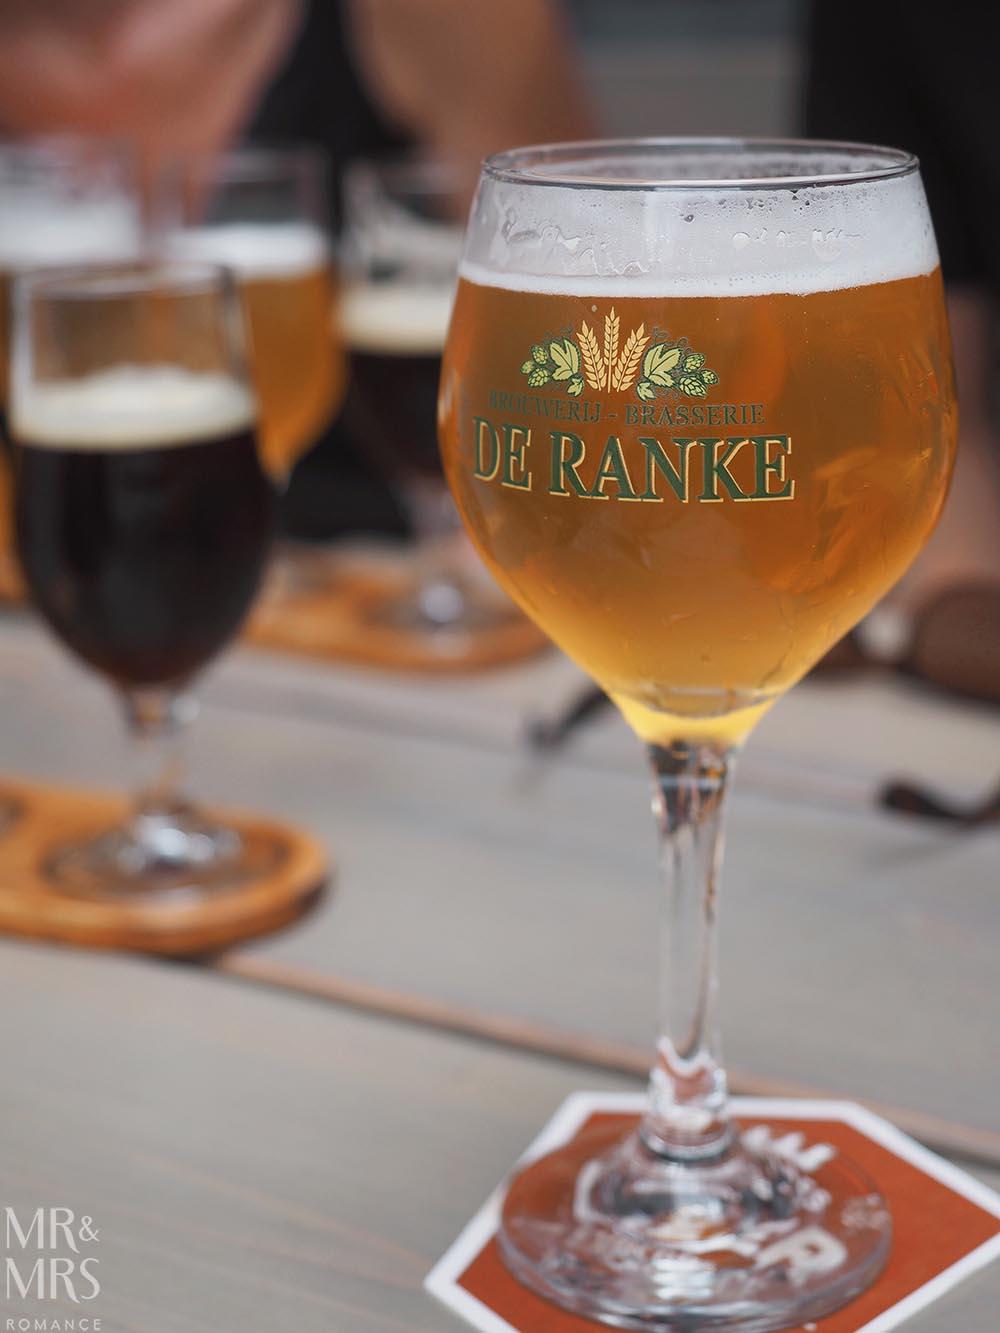 Where to drink in Bruges - Belgian beers